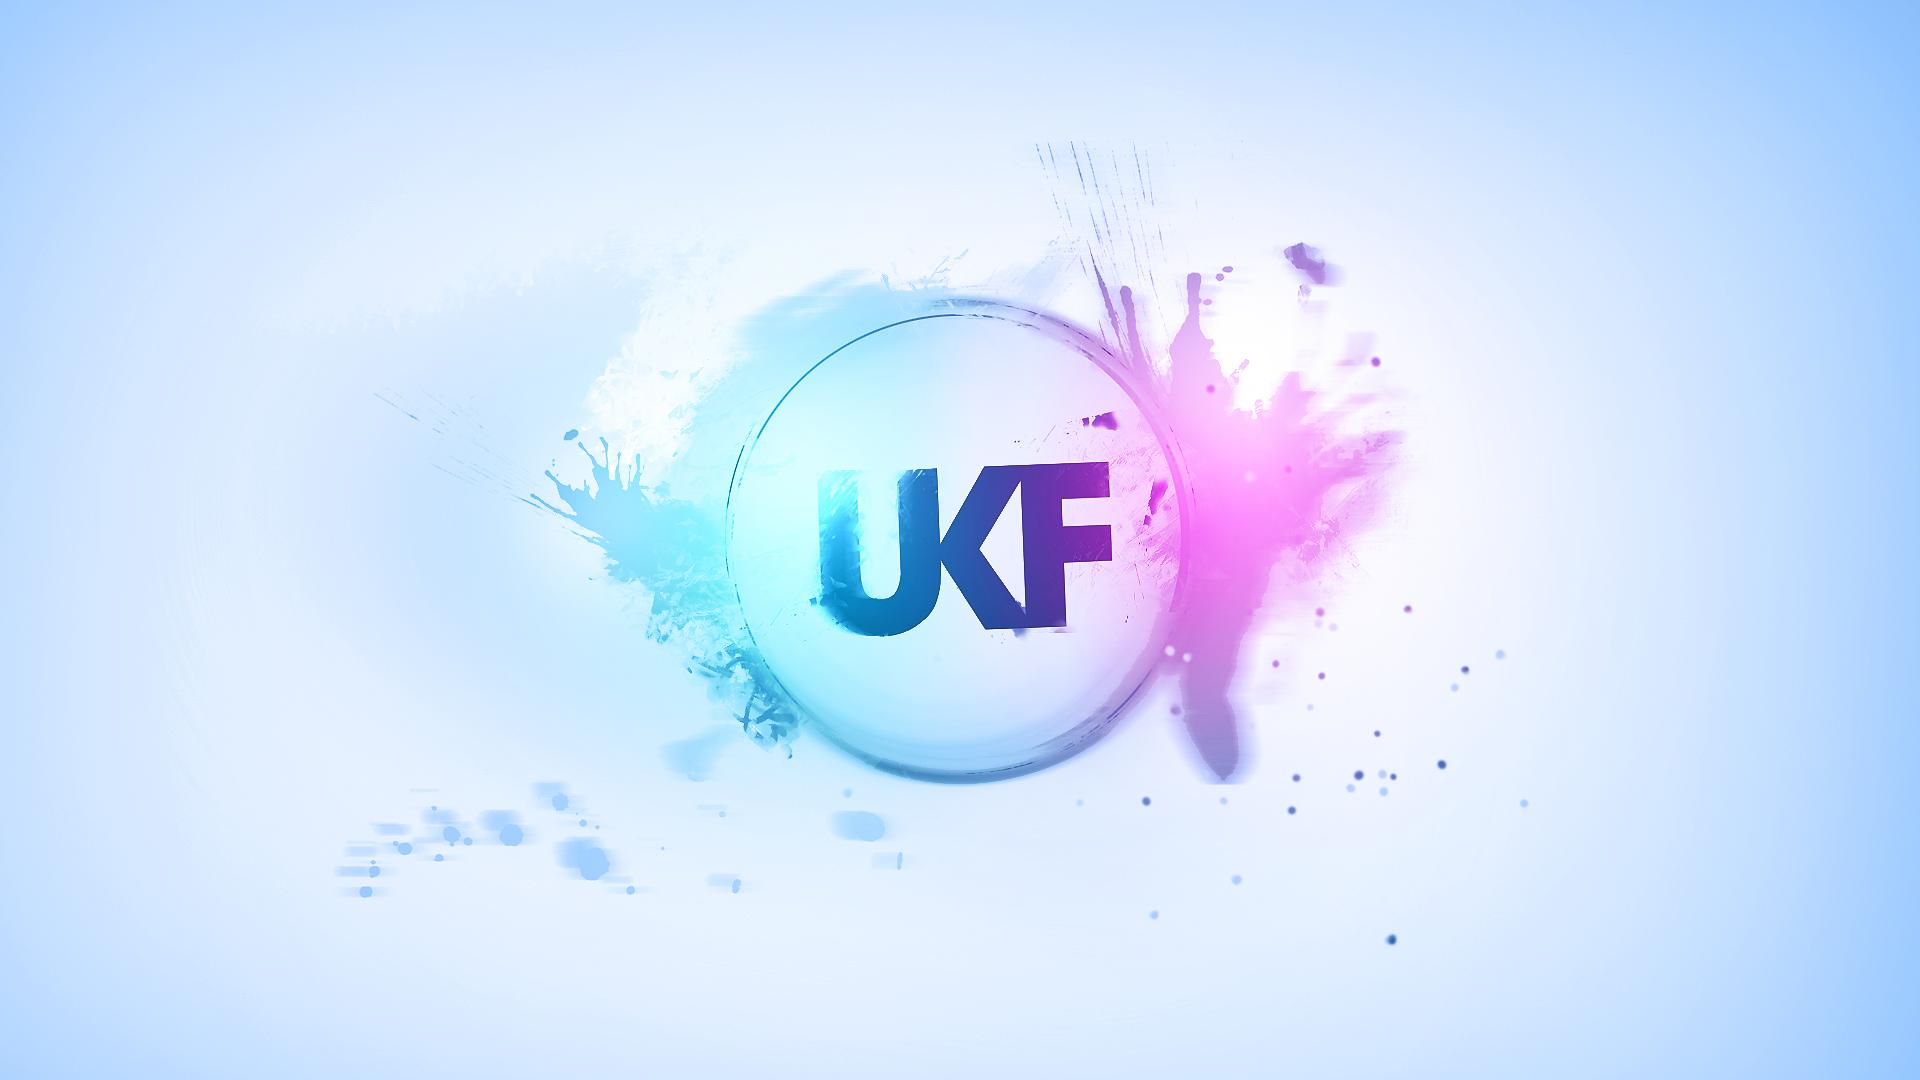 Ukf Liquid Wallpaper Edited New Cl By Zionellosvk On